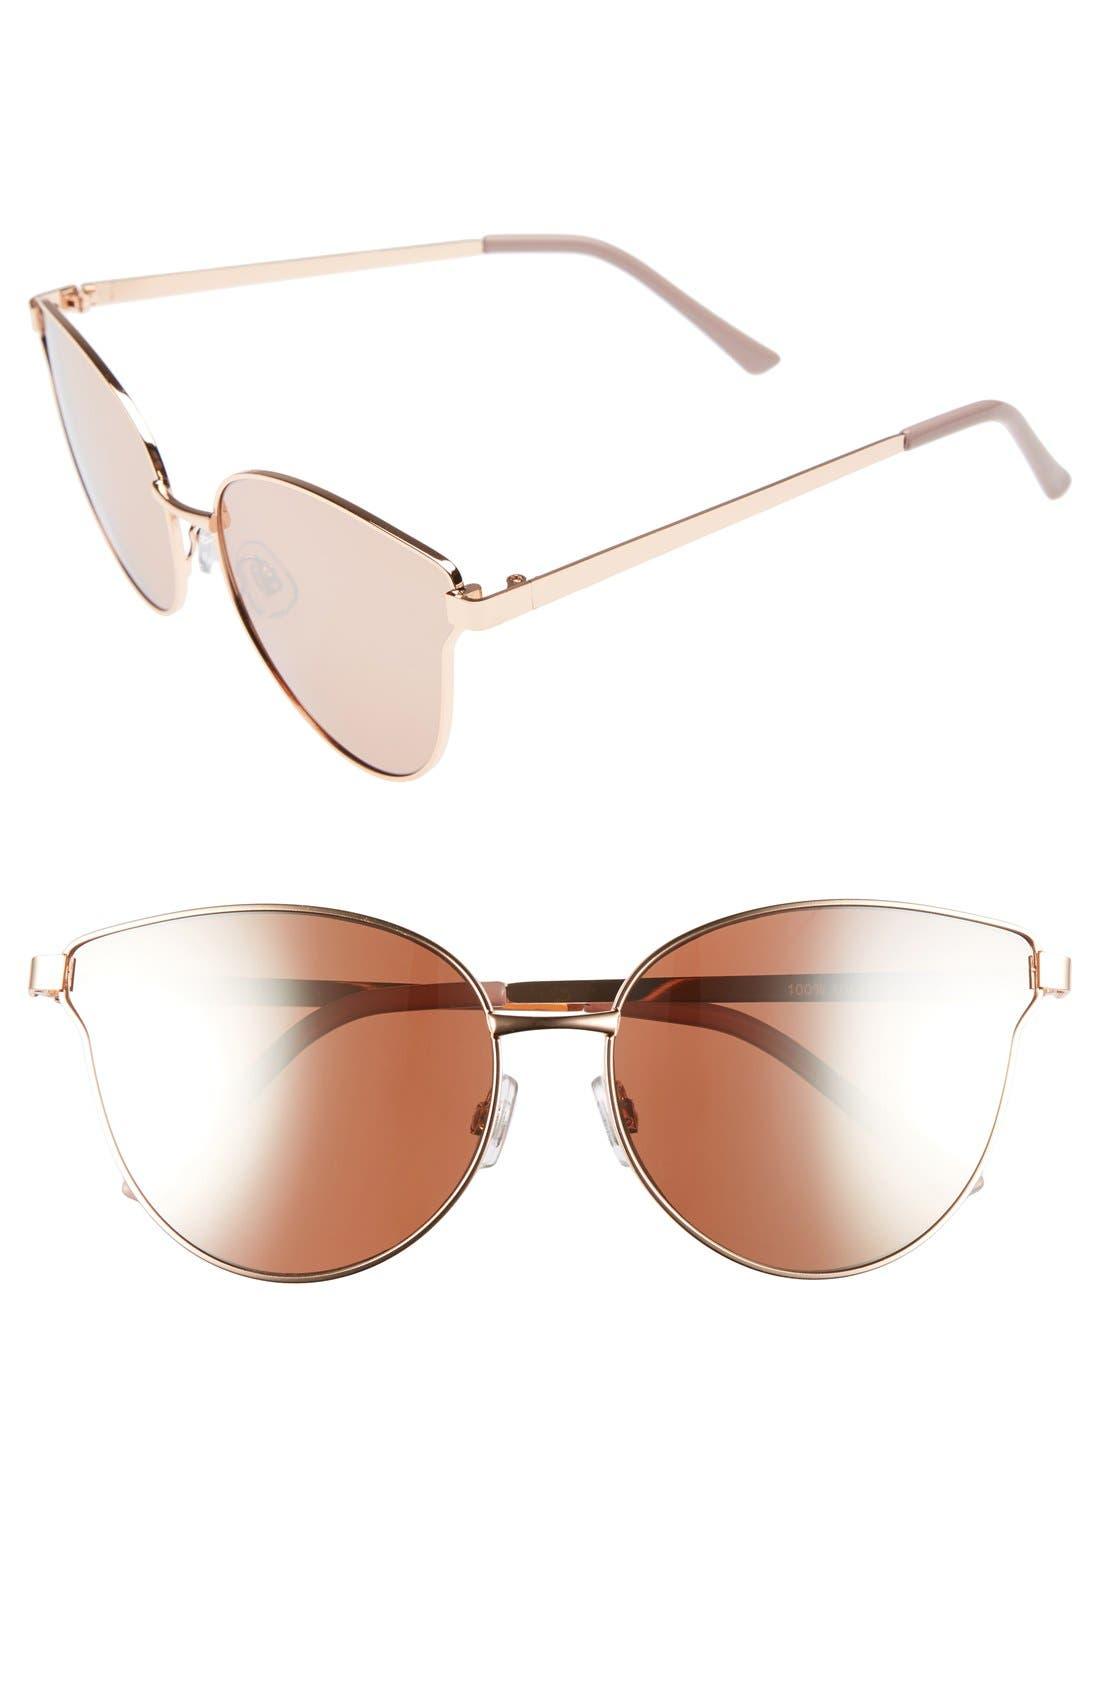 Main Image - BP. 57mm Mirrored Metal Cat Eye Sunglasses